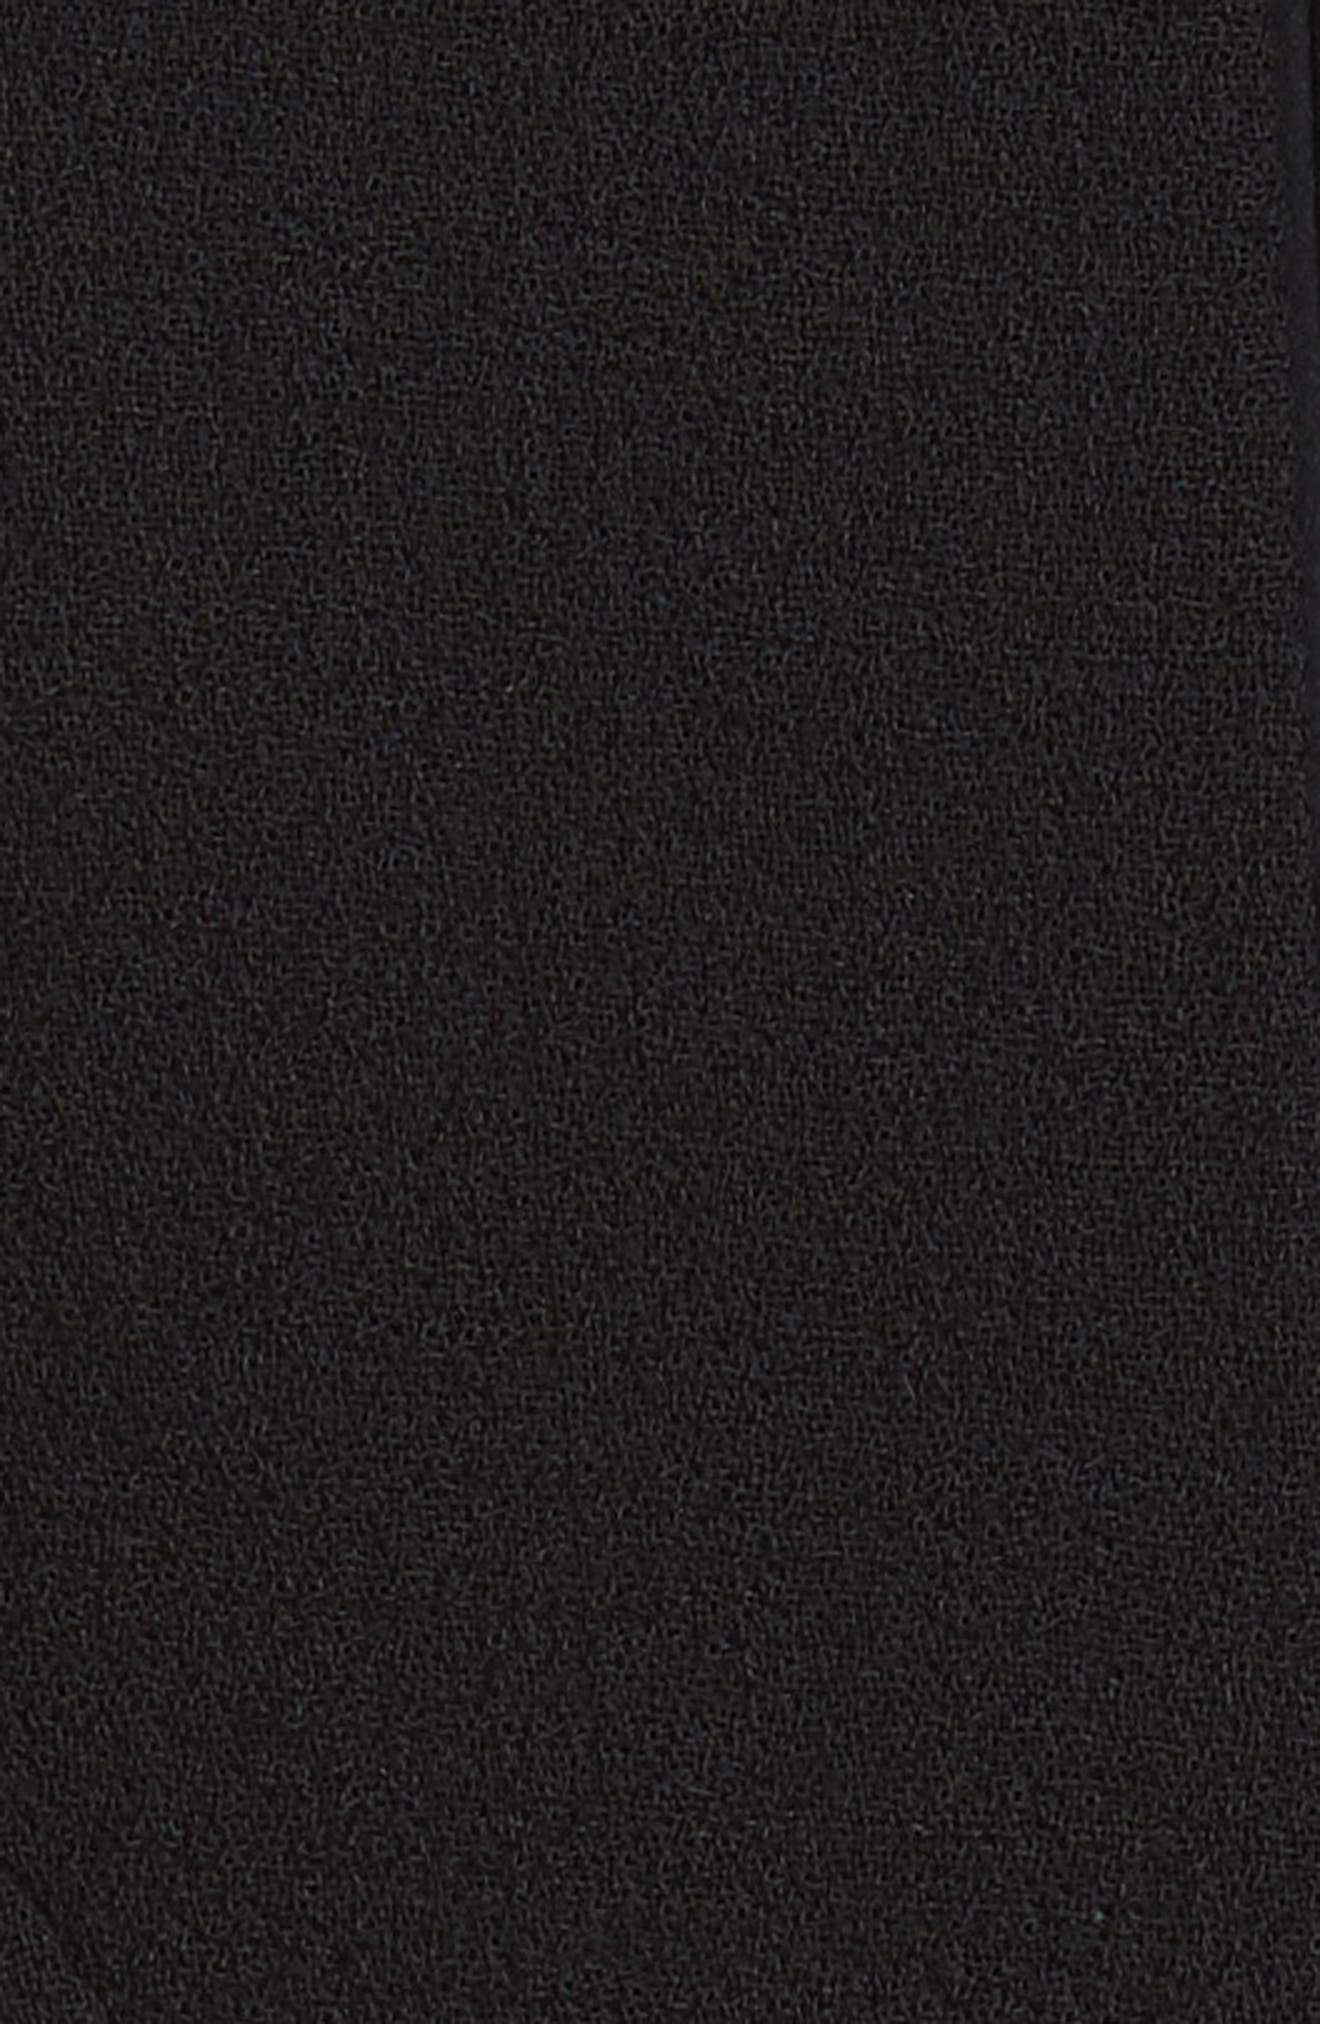 Carmen Marc Valvo Double Face Wool Crepe Sheath Dress,                             Alternate thumbnail 9, color,